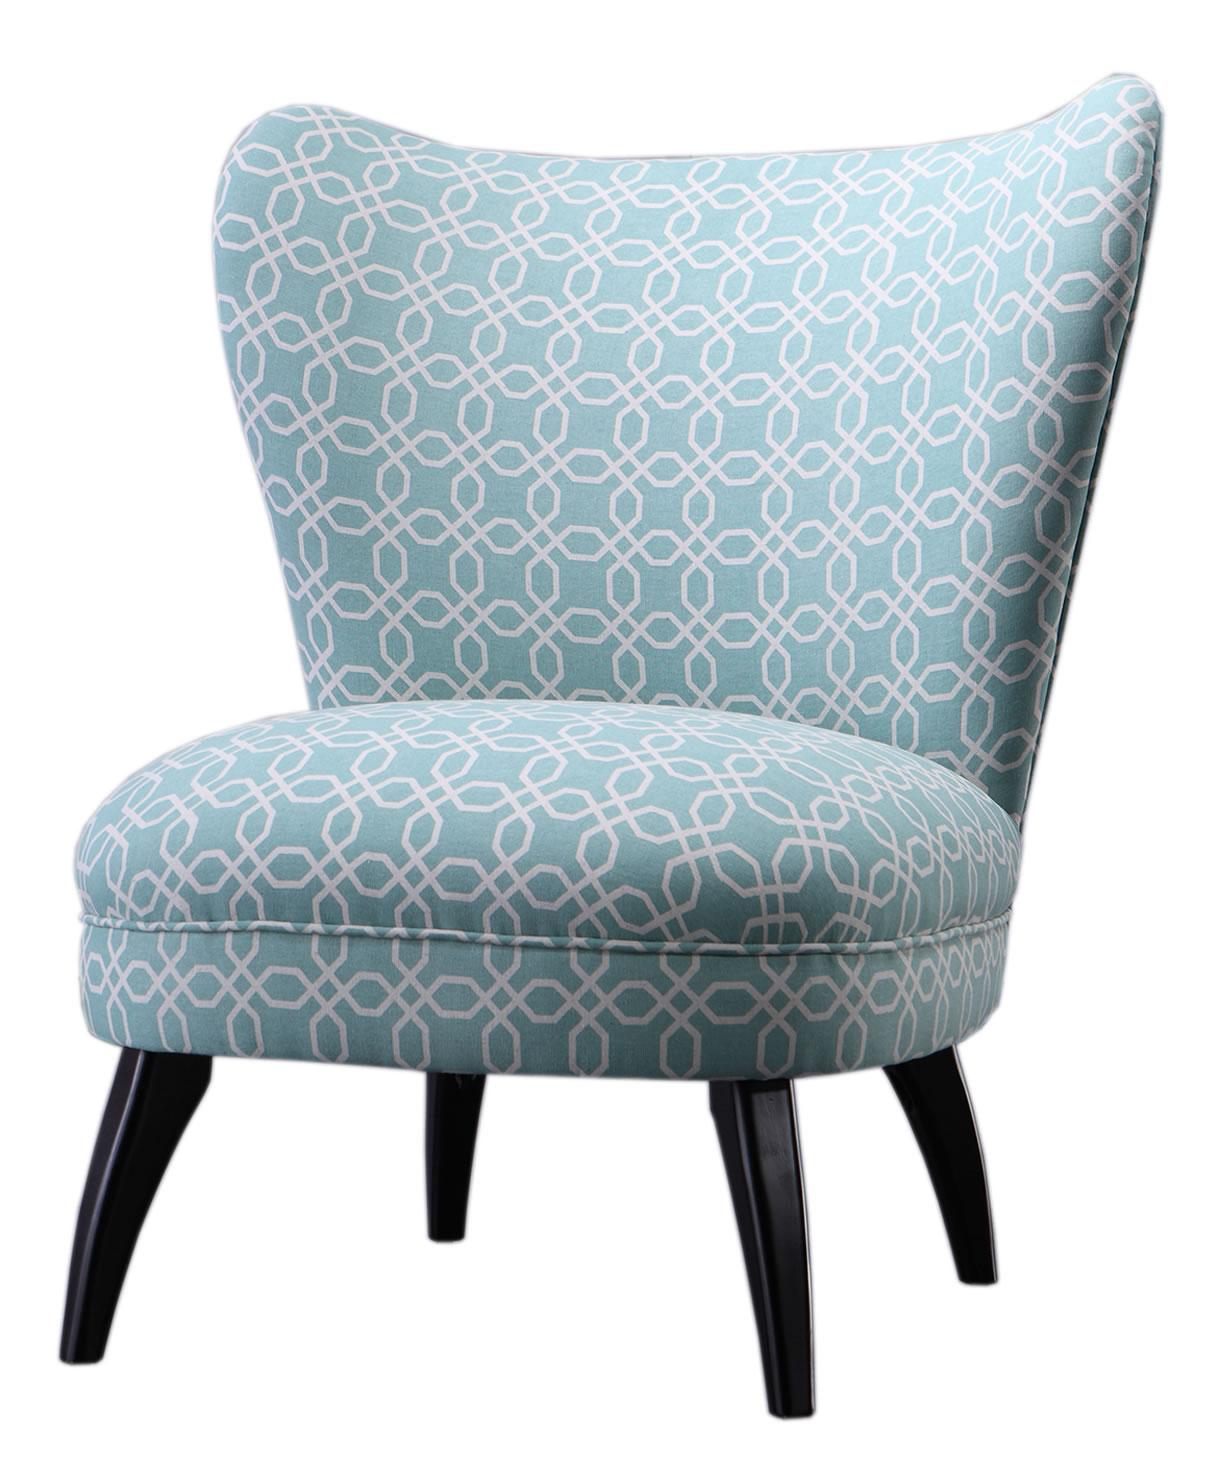 Sessel gemustert  Cocktailsessel, Bezug aus Stoff, hellblau gemustert, B79 x T82 x ...